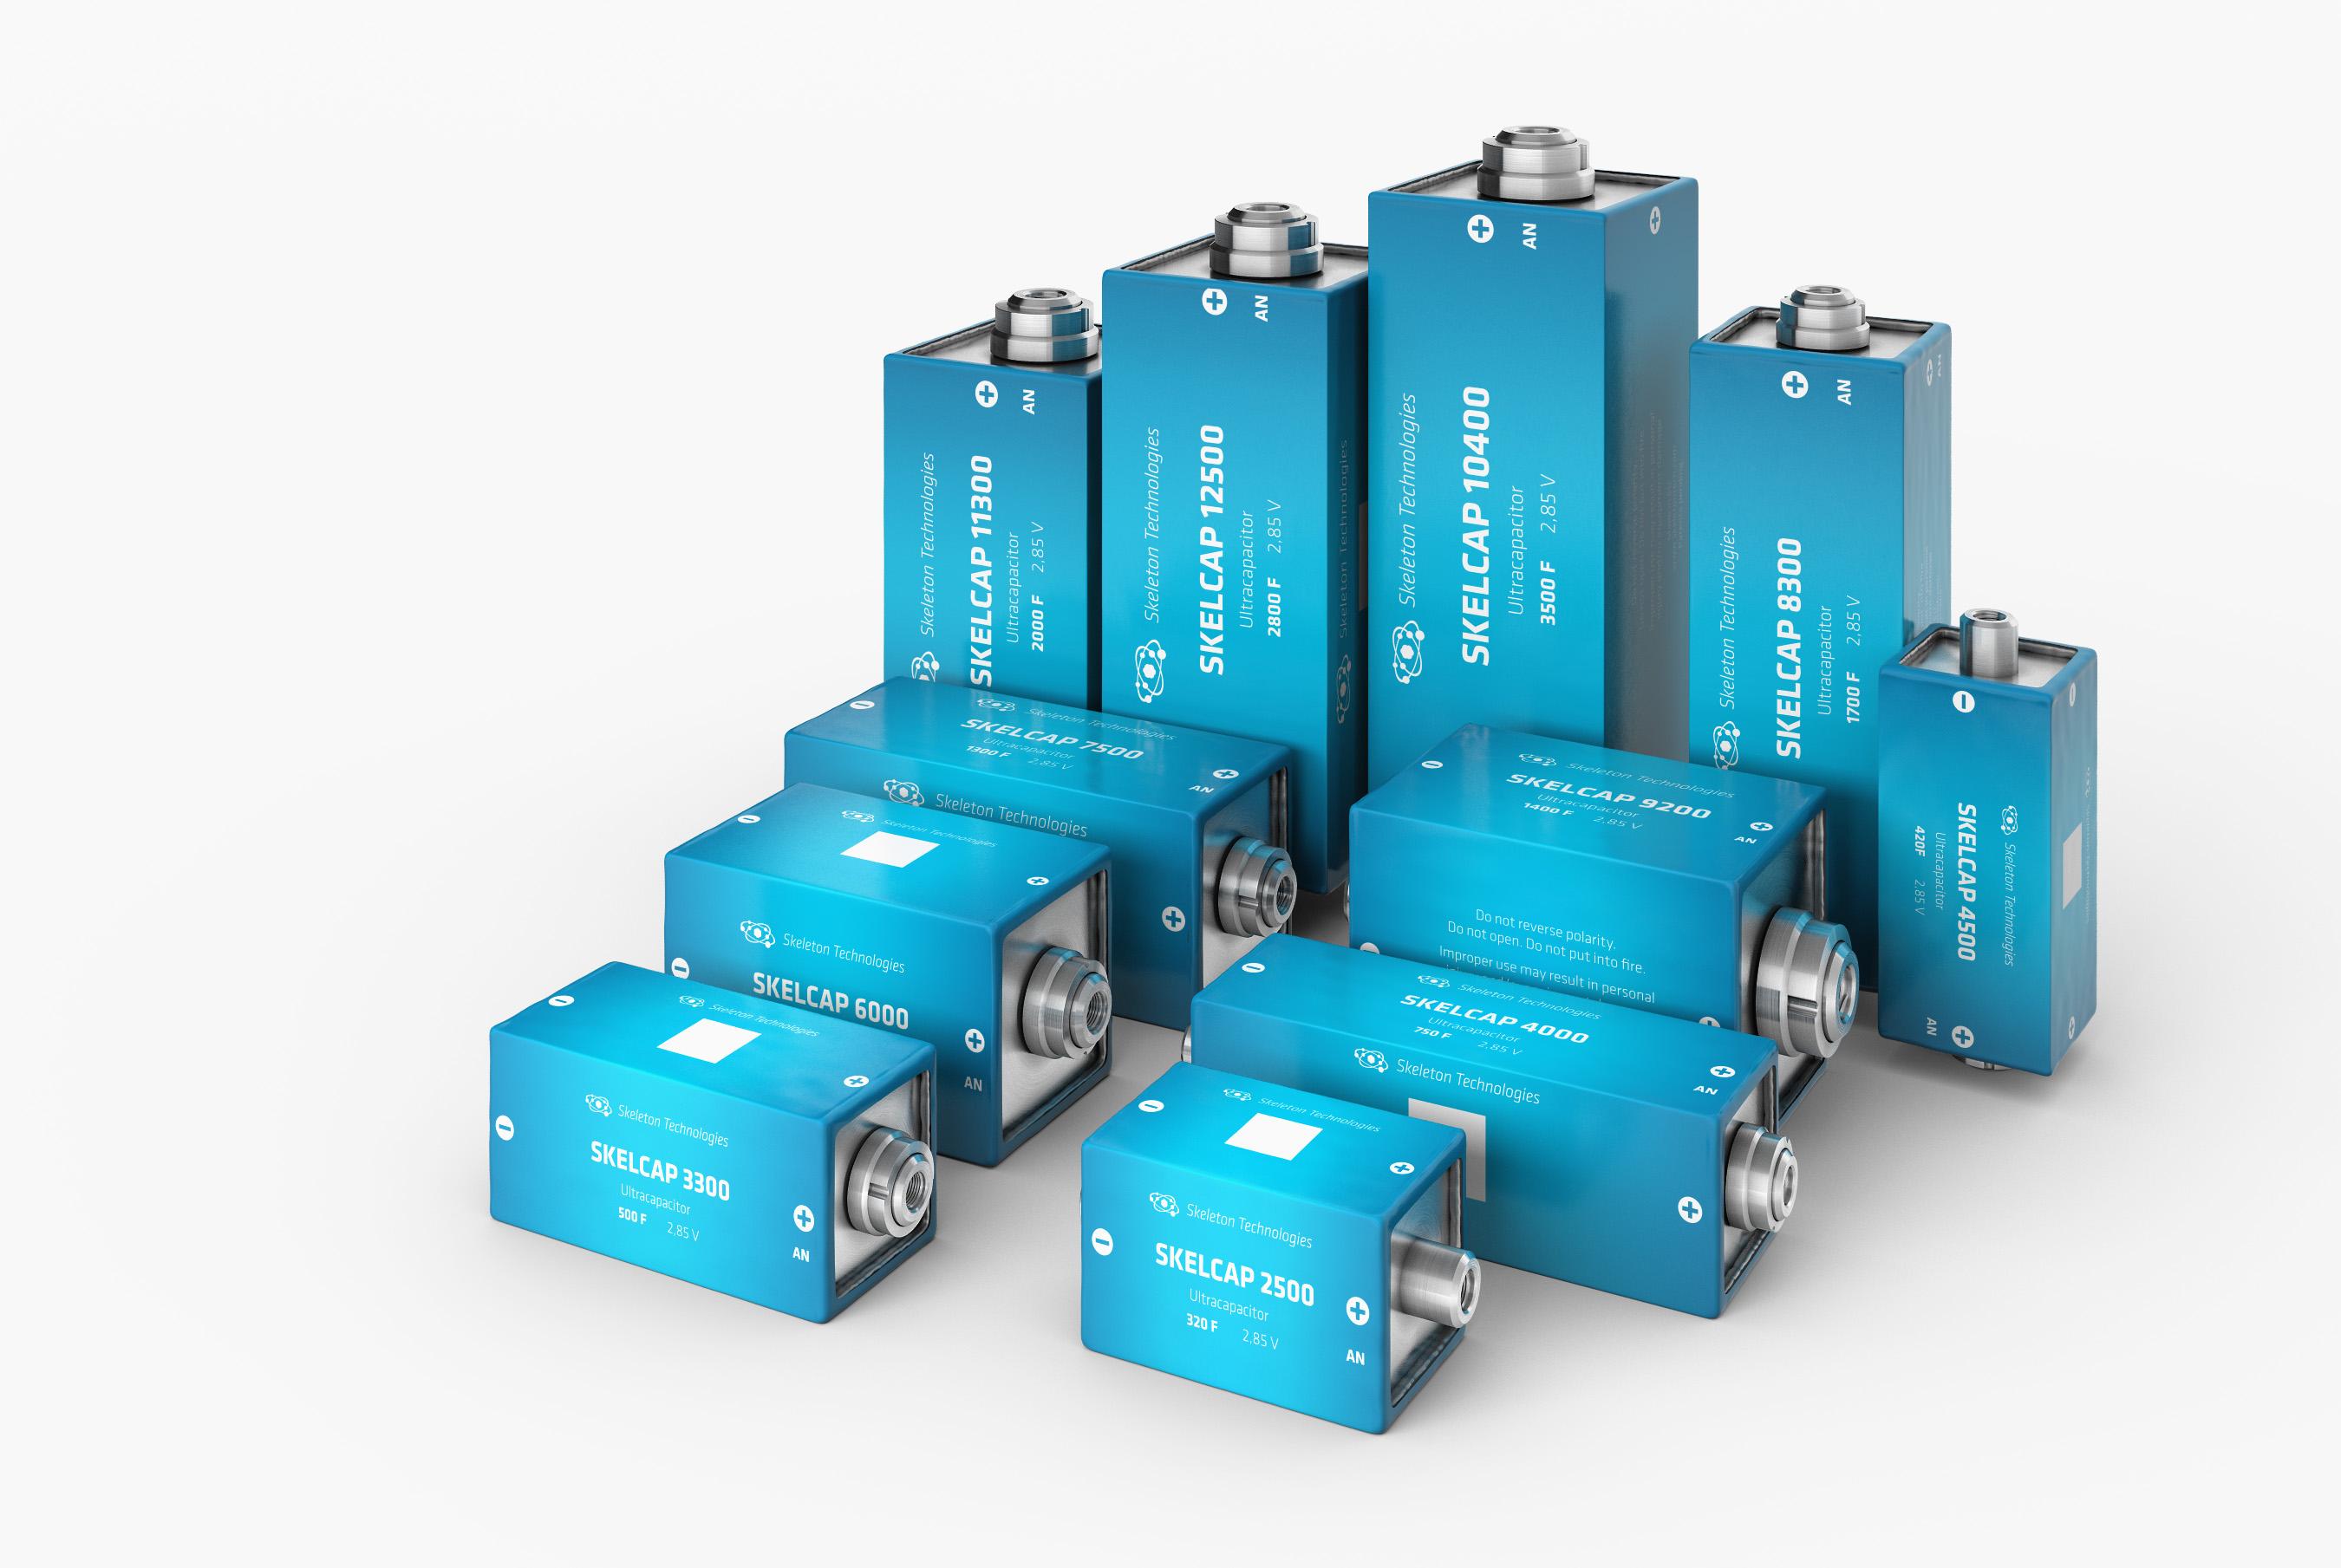 Ultracapacitor Manufacturer Skeleton Technologies Raises € ...